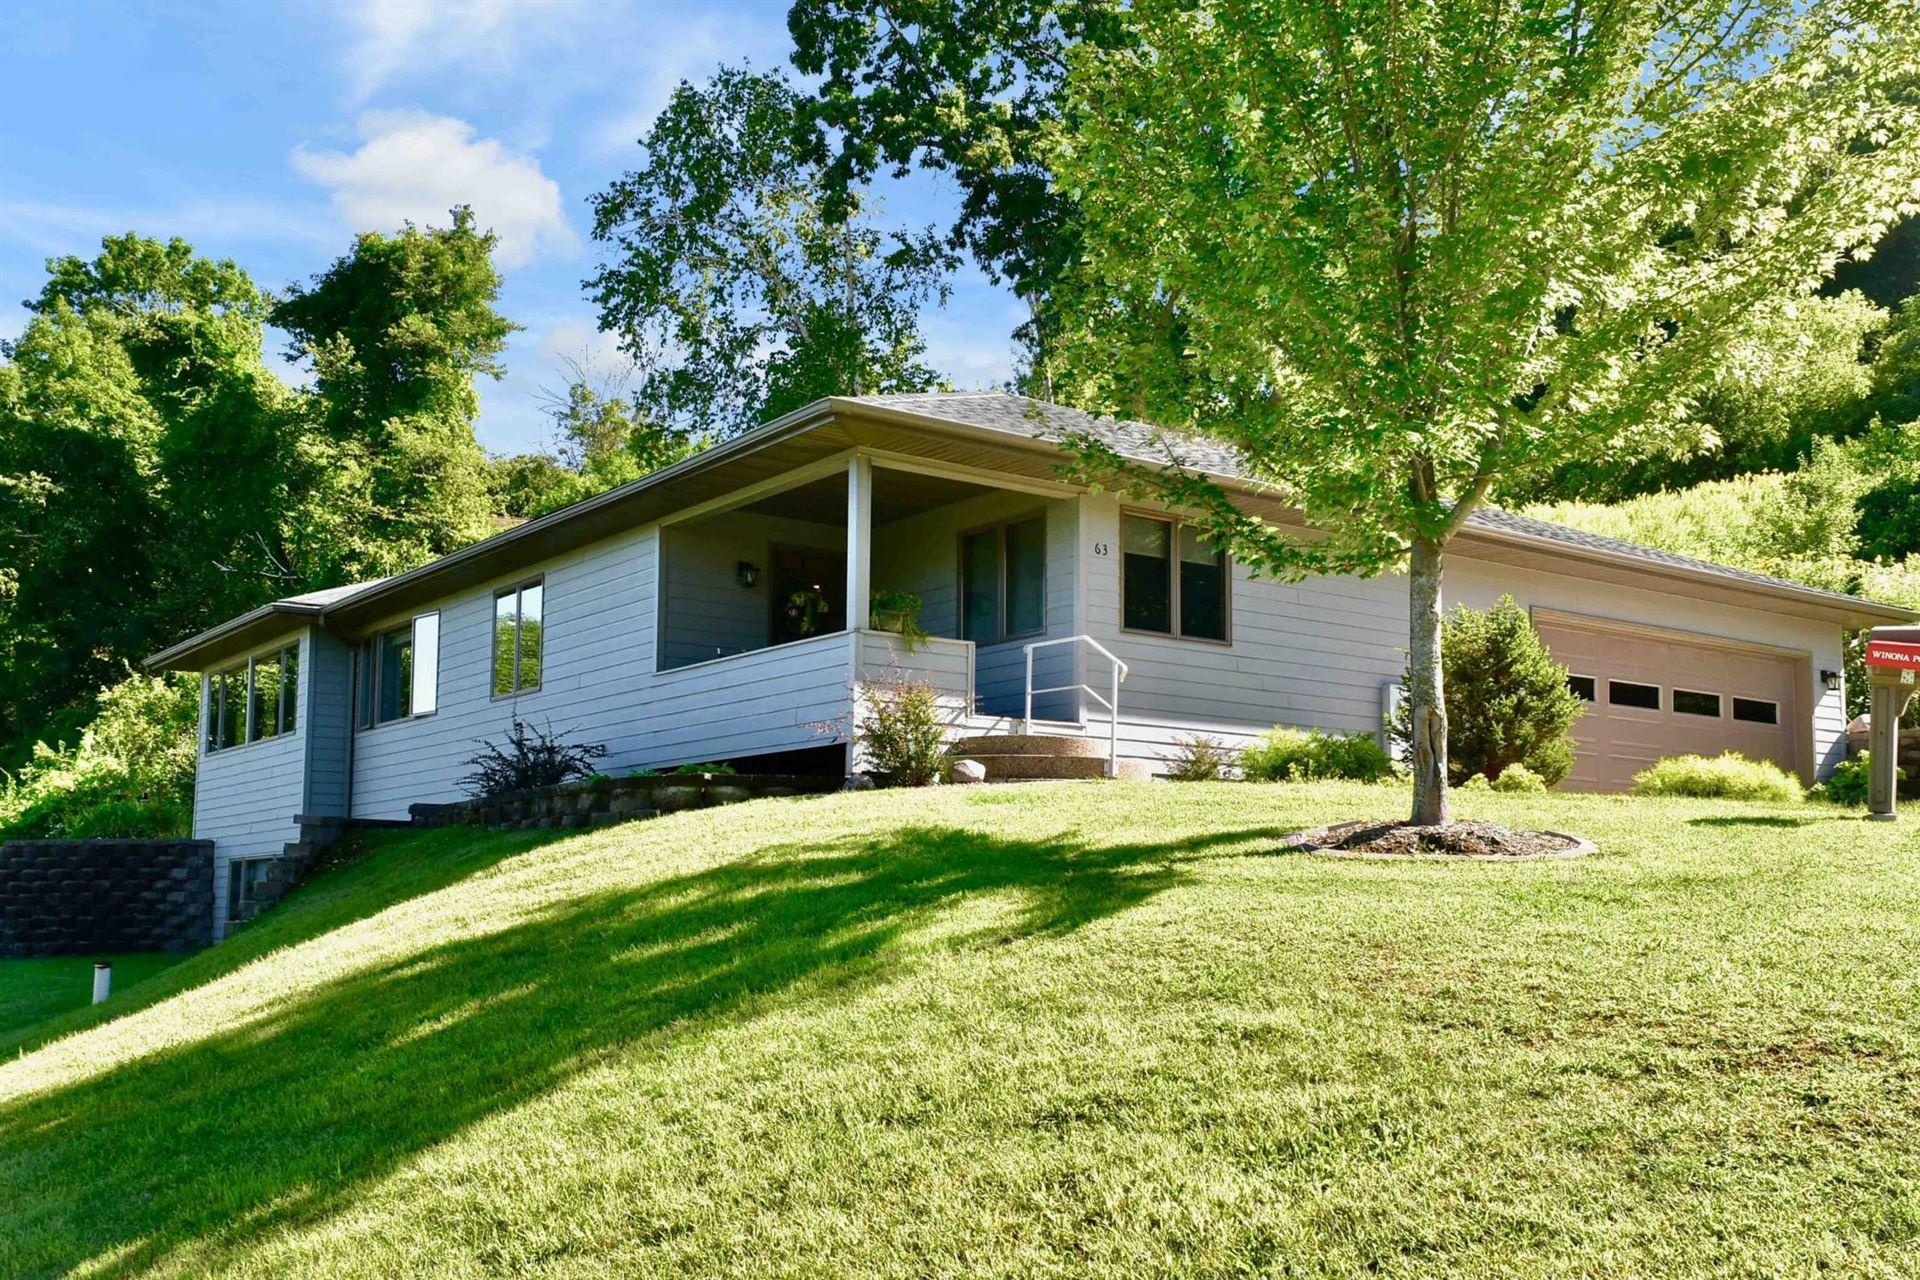 63 Penny Lane, Winona, MN 55987 - MLS#: 5649968